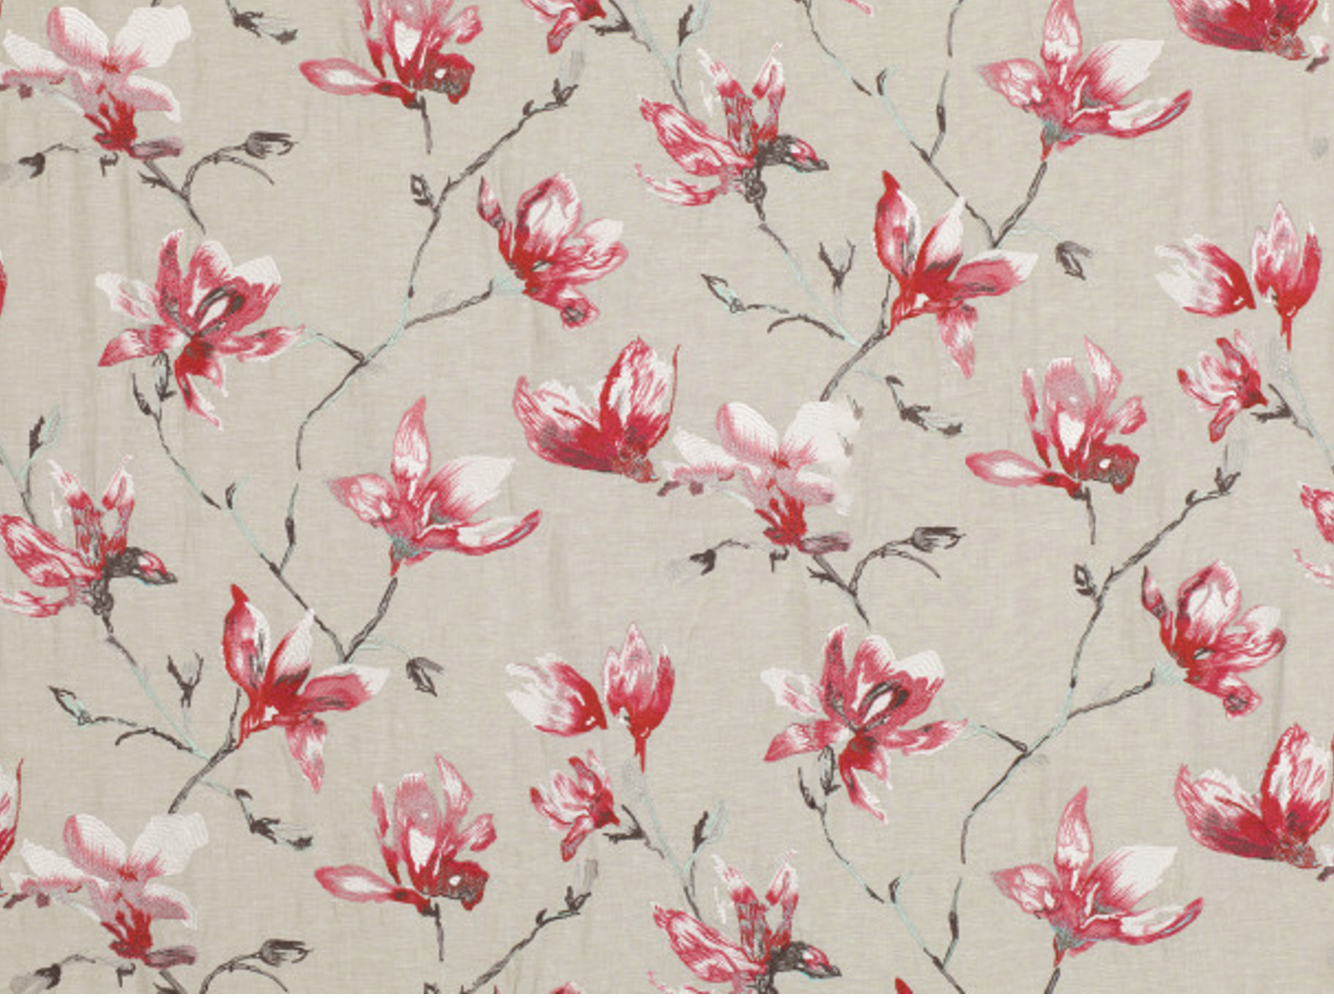 Saphira Embroidery Rocoto 7748/01